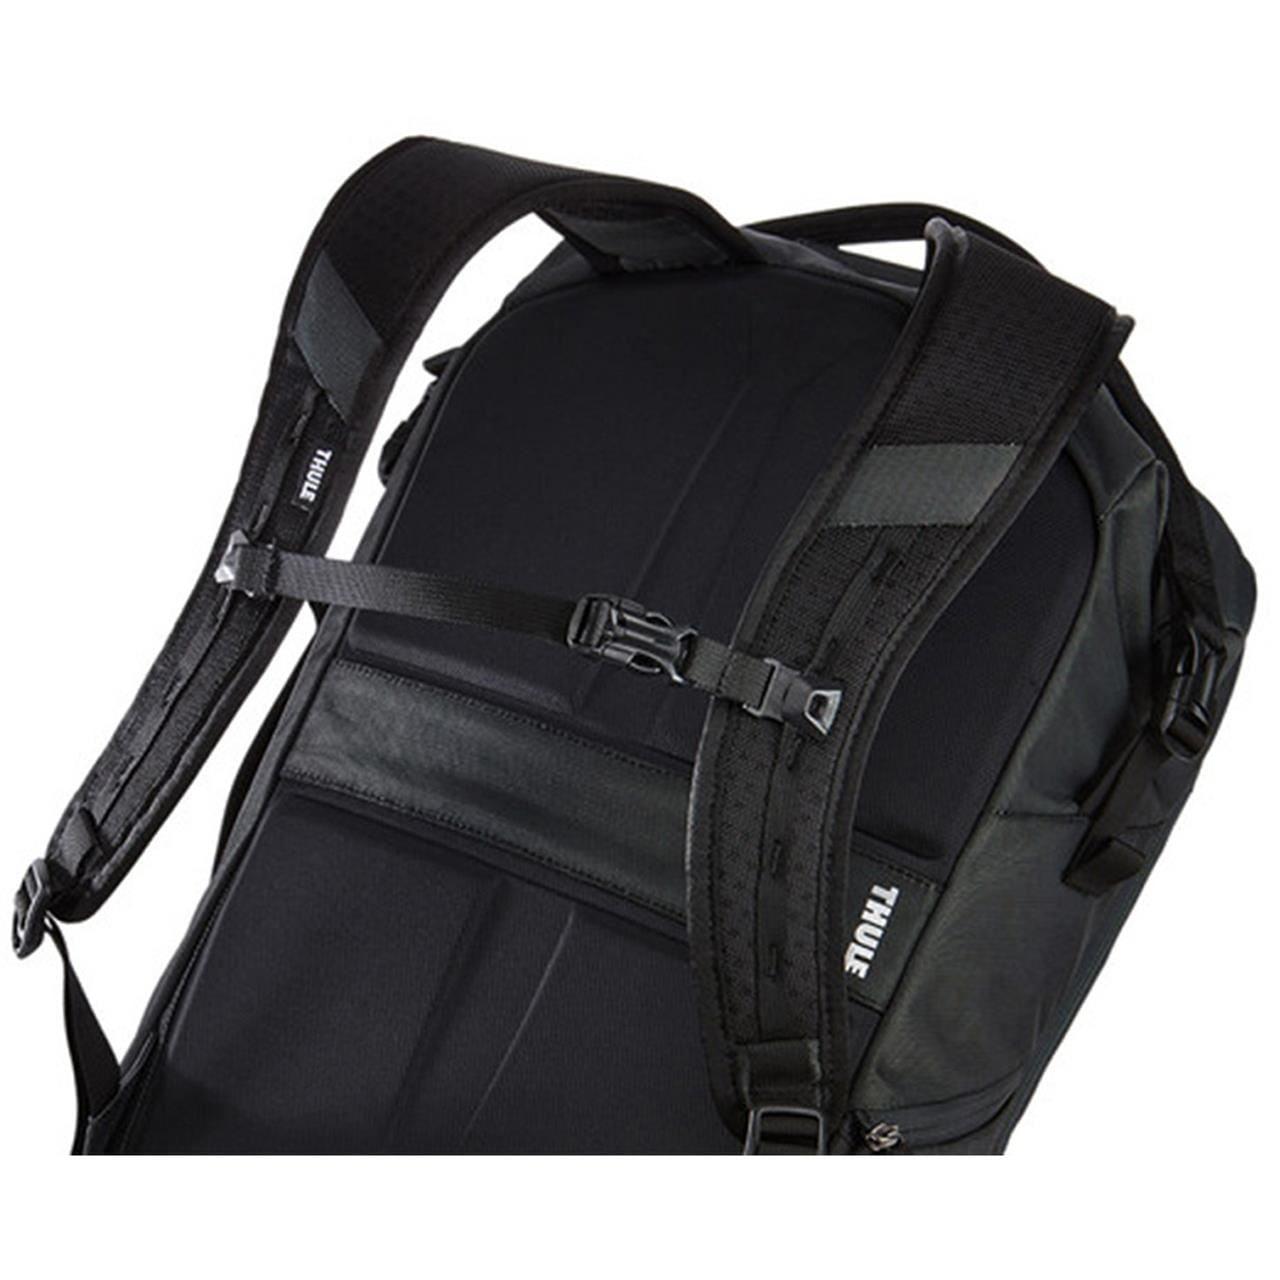 Rucsac urban cu compartiment laptop Thule Subterra Travel Backpack 34L Dark Shadow 3